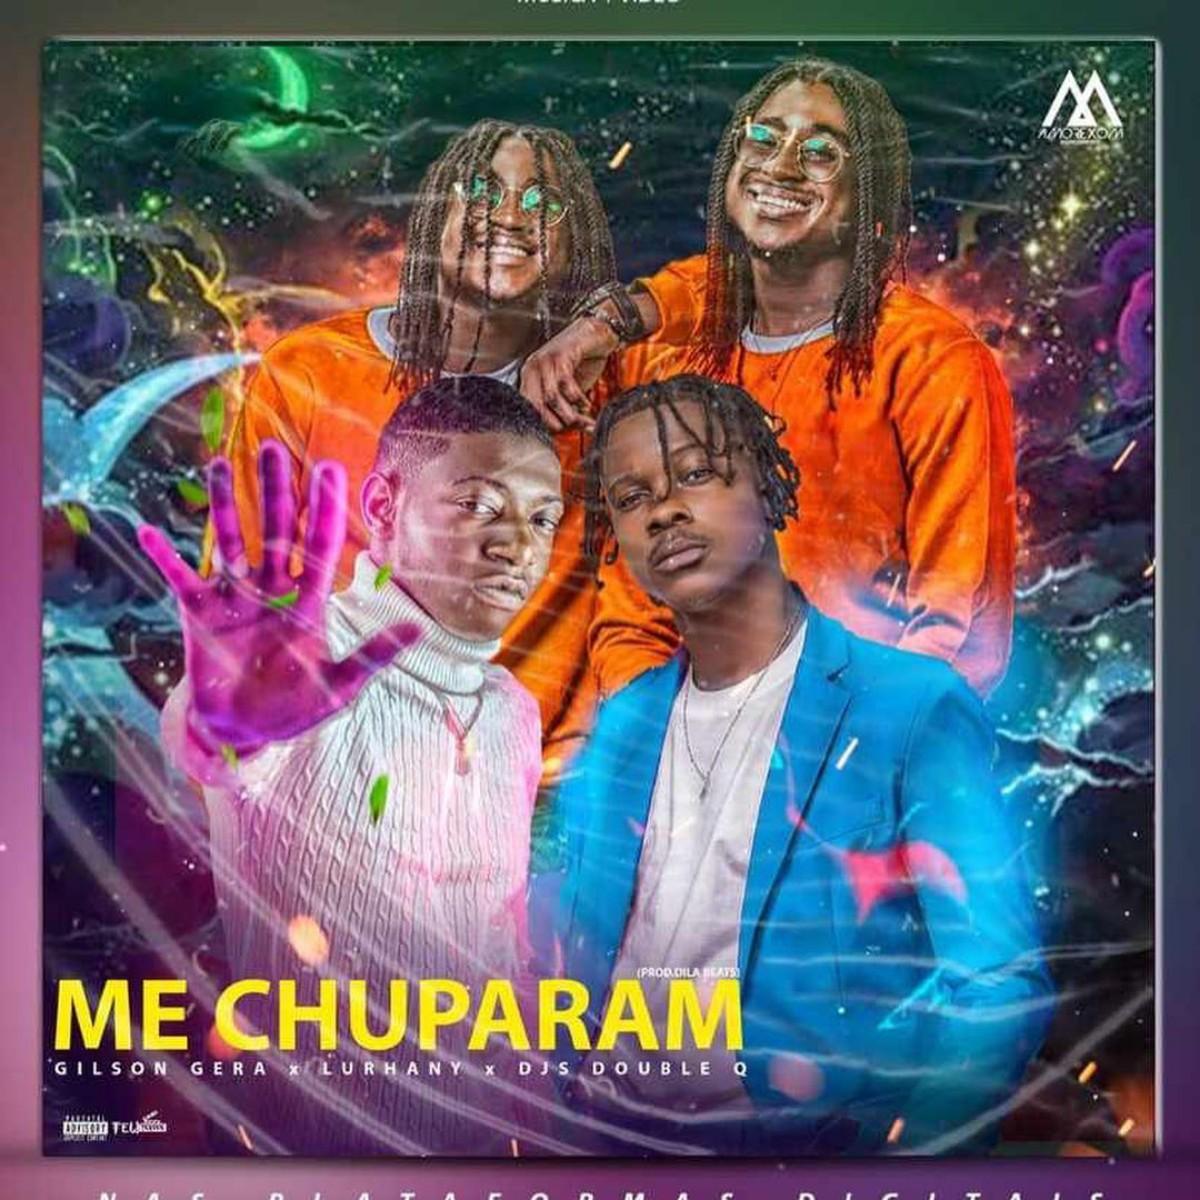 Gilson Gera - Me Chuparam (feat. Lurhany & Djs Double)